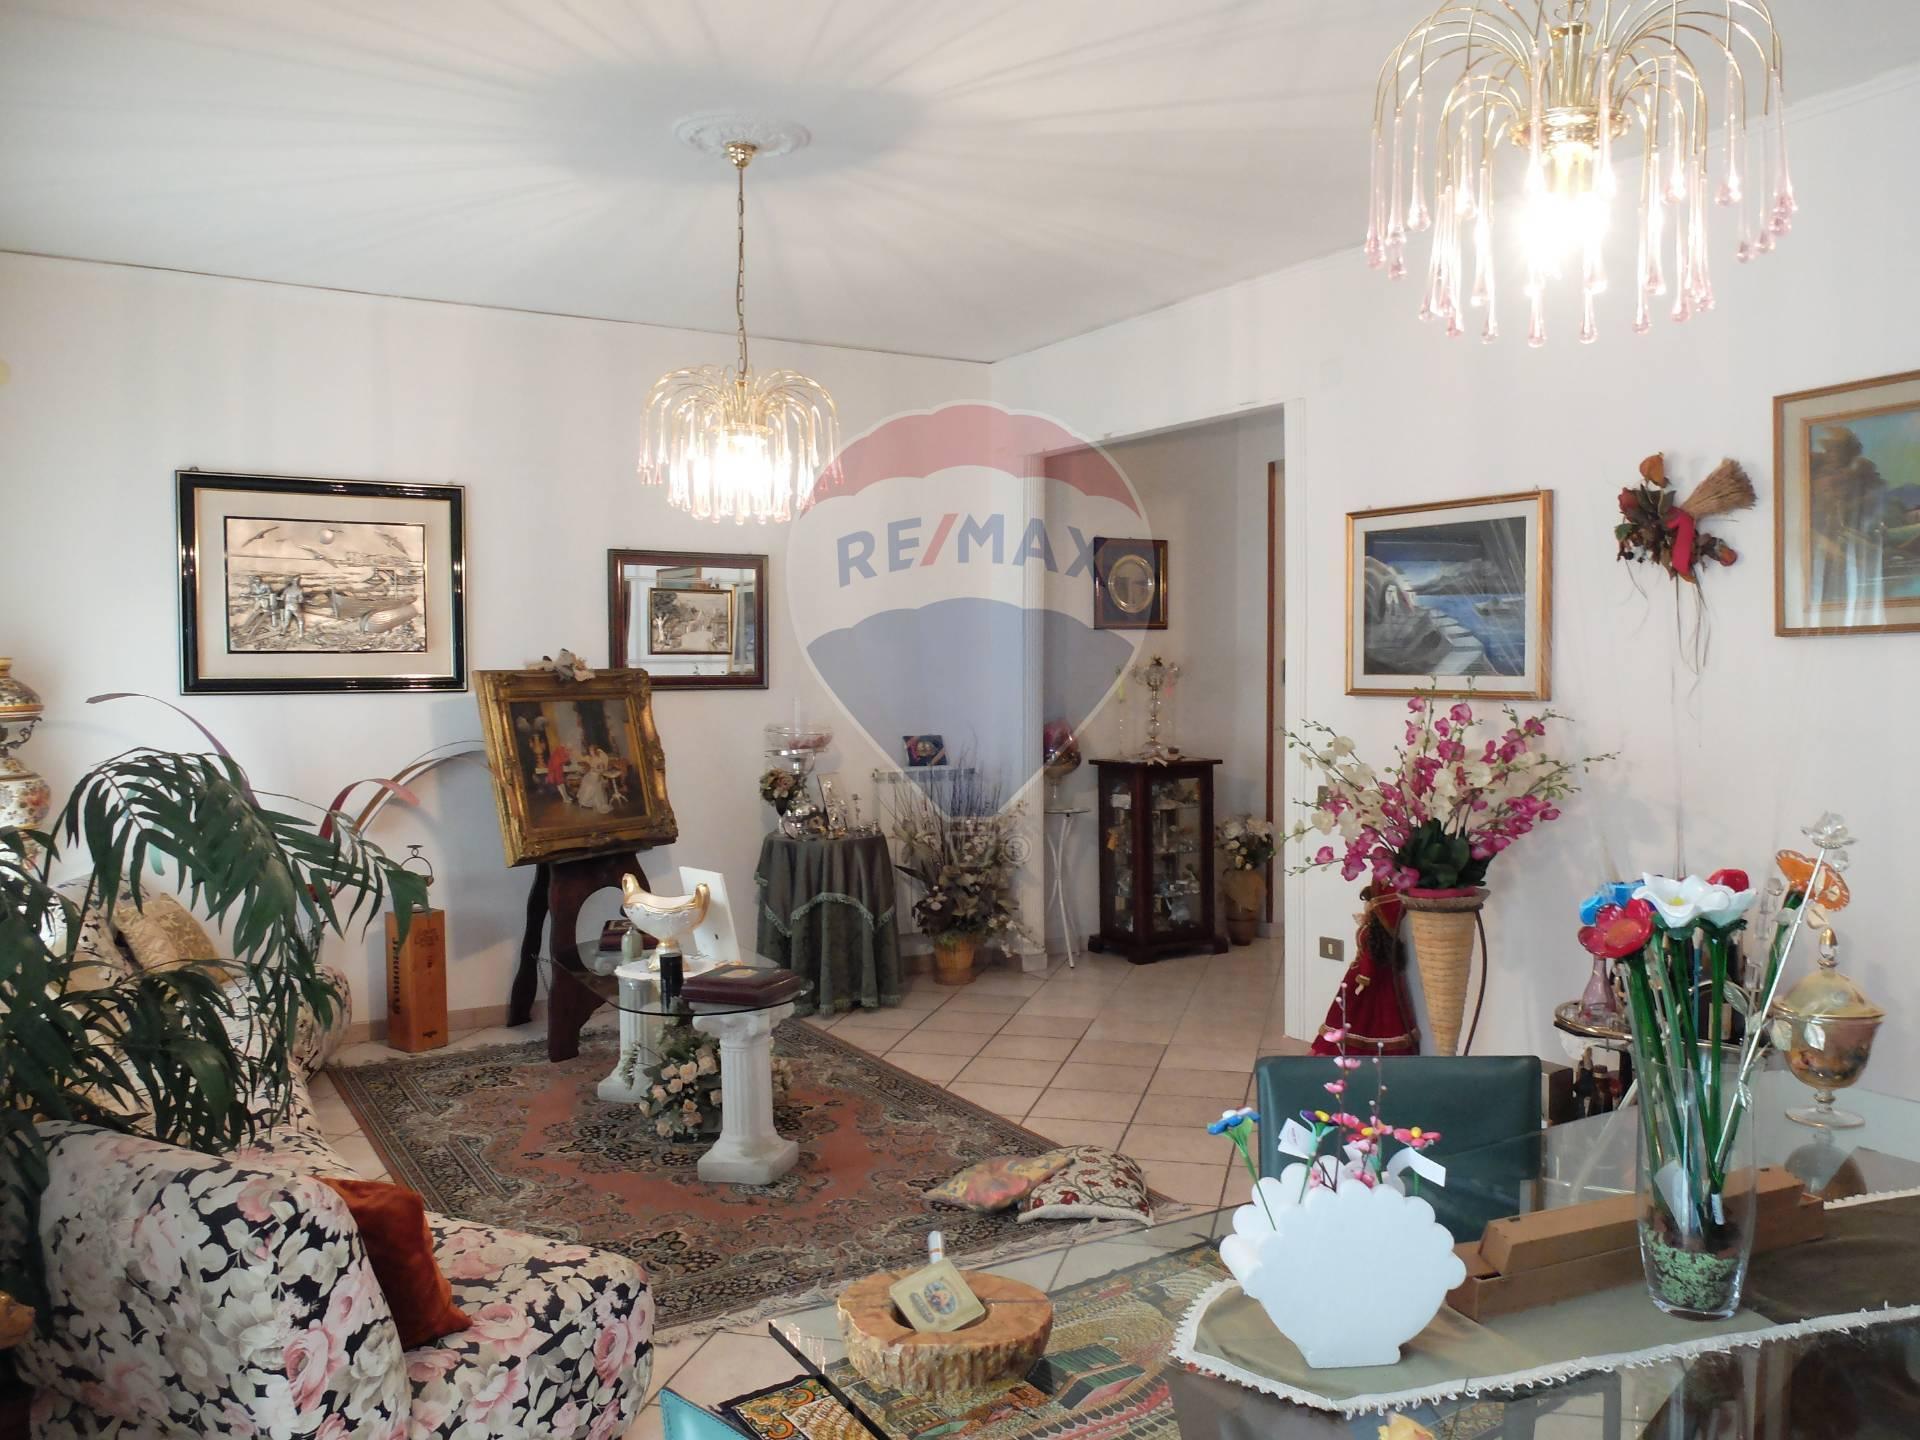 Appartamento in vendita Caserta 2 (Cerasola)-Via Petrarca Caserta